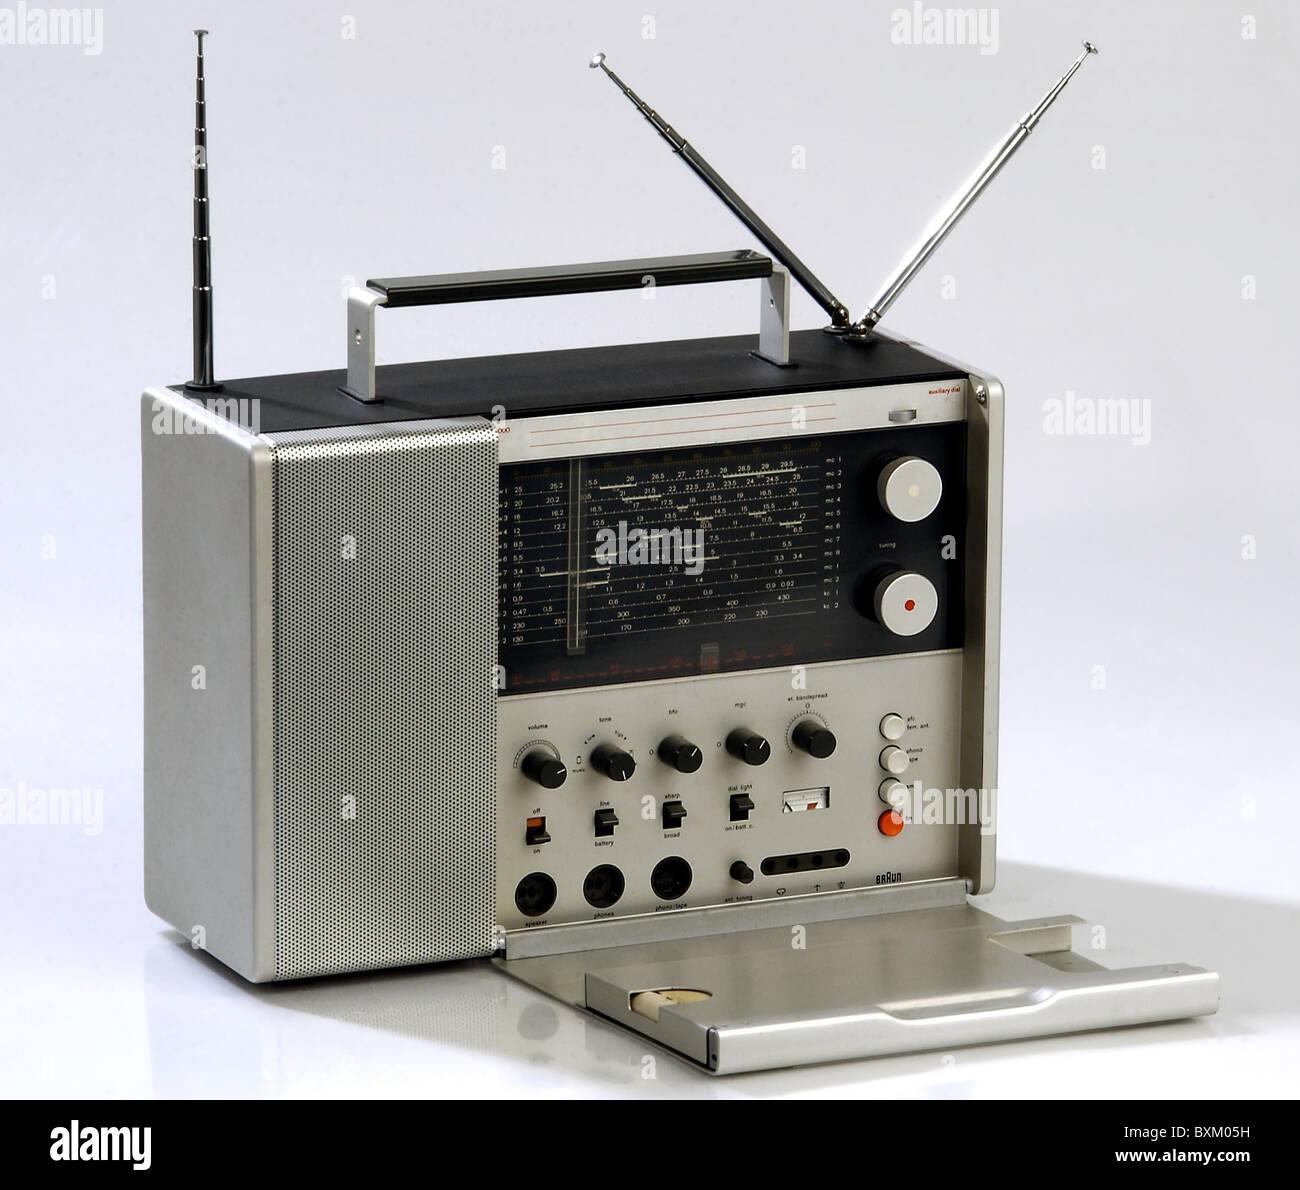 broadcast, radio, Braun radio set T 1000, Germany, 1963, communications, technic, technics, historic, historical, - Stock Image